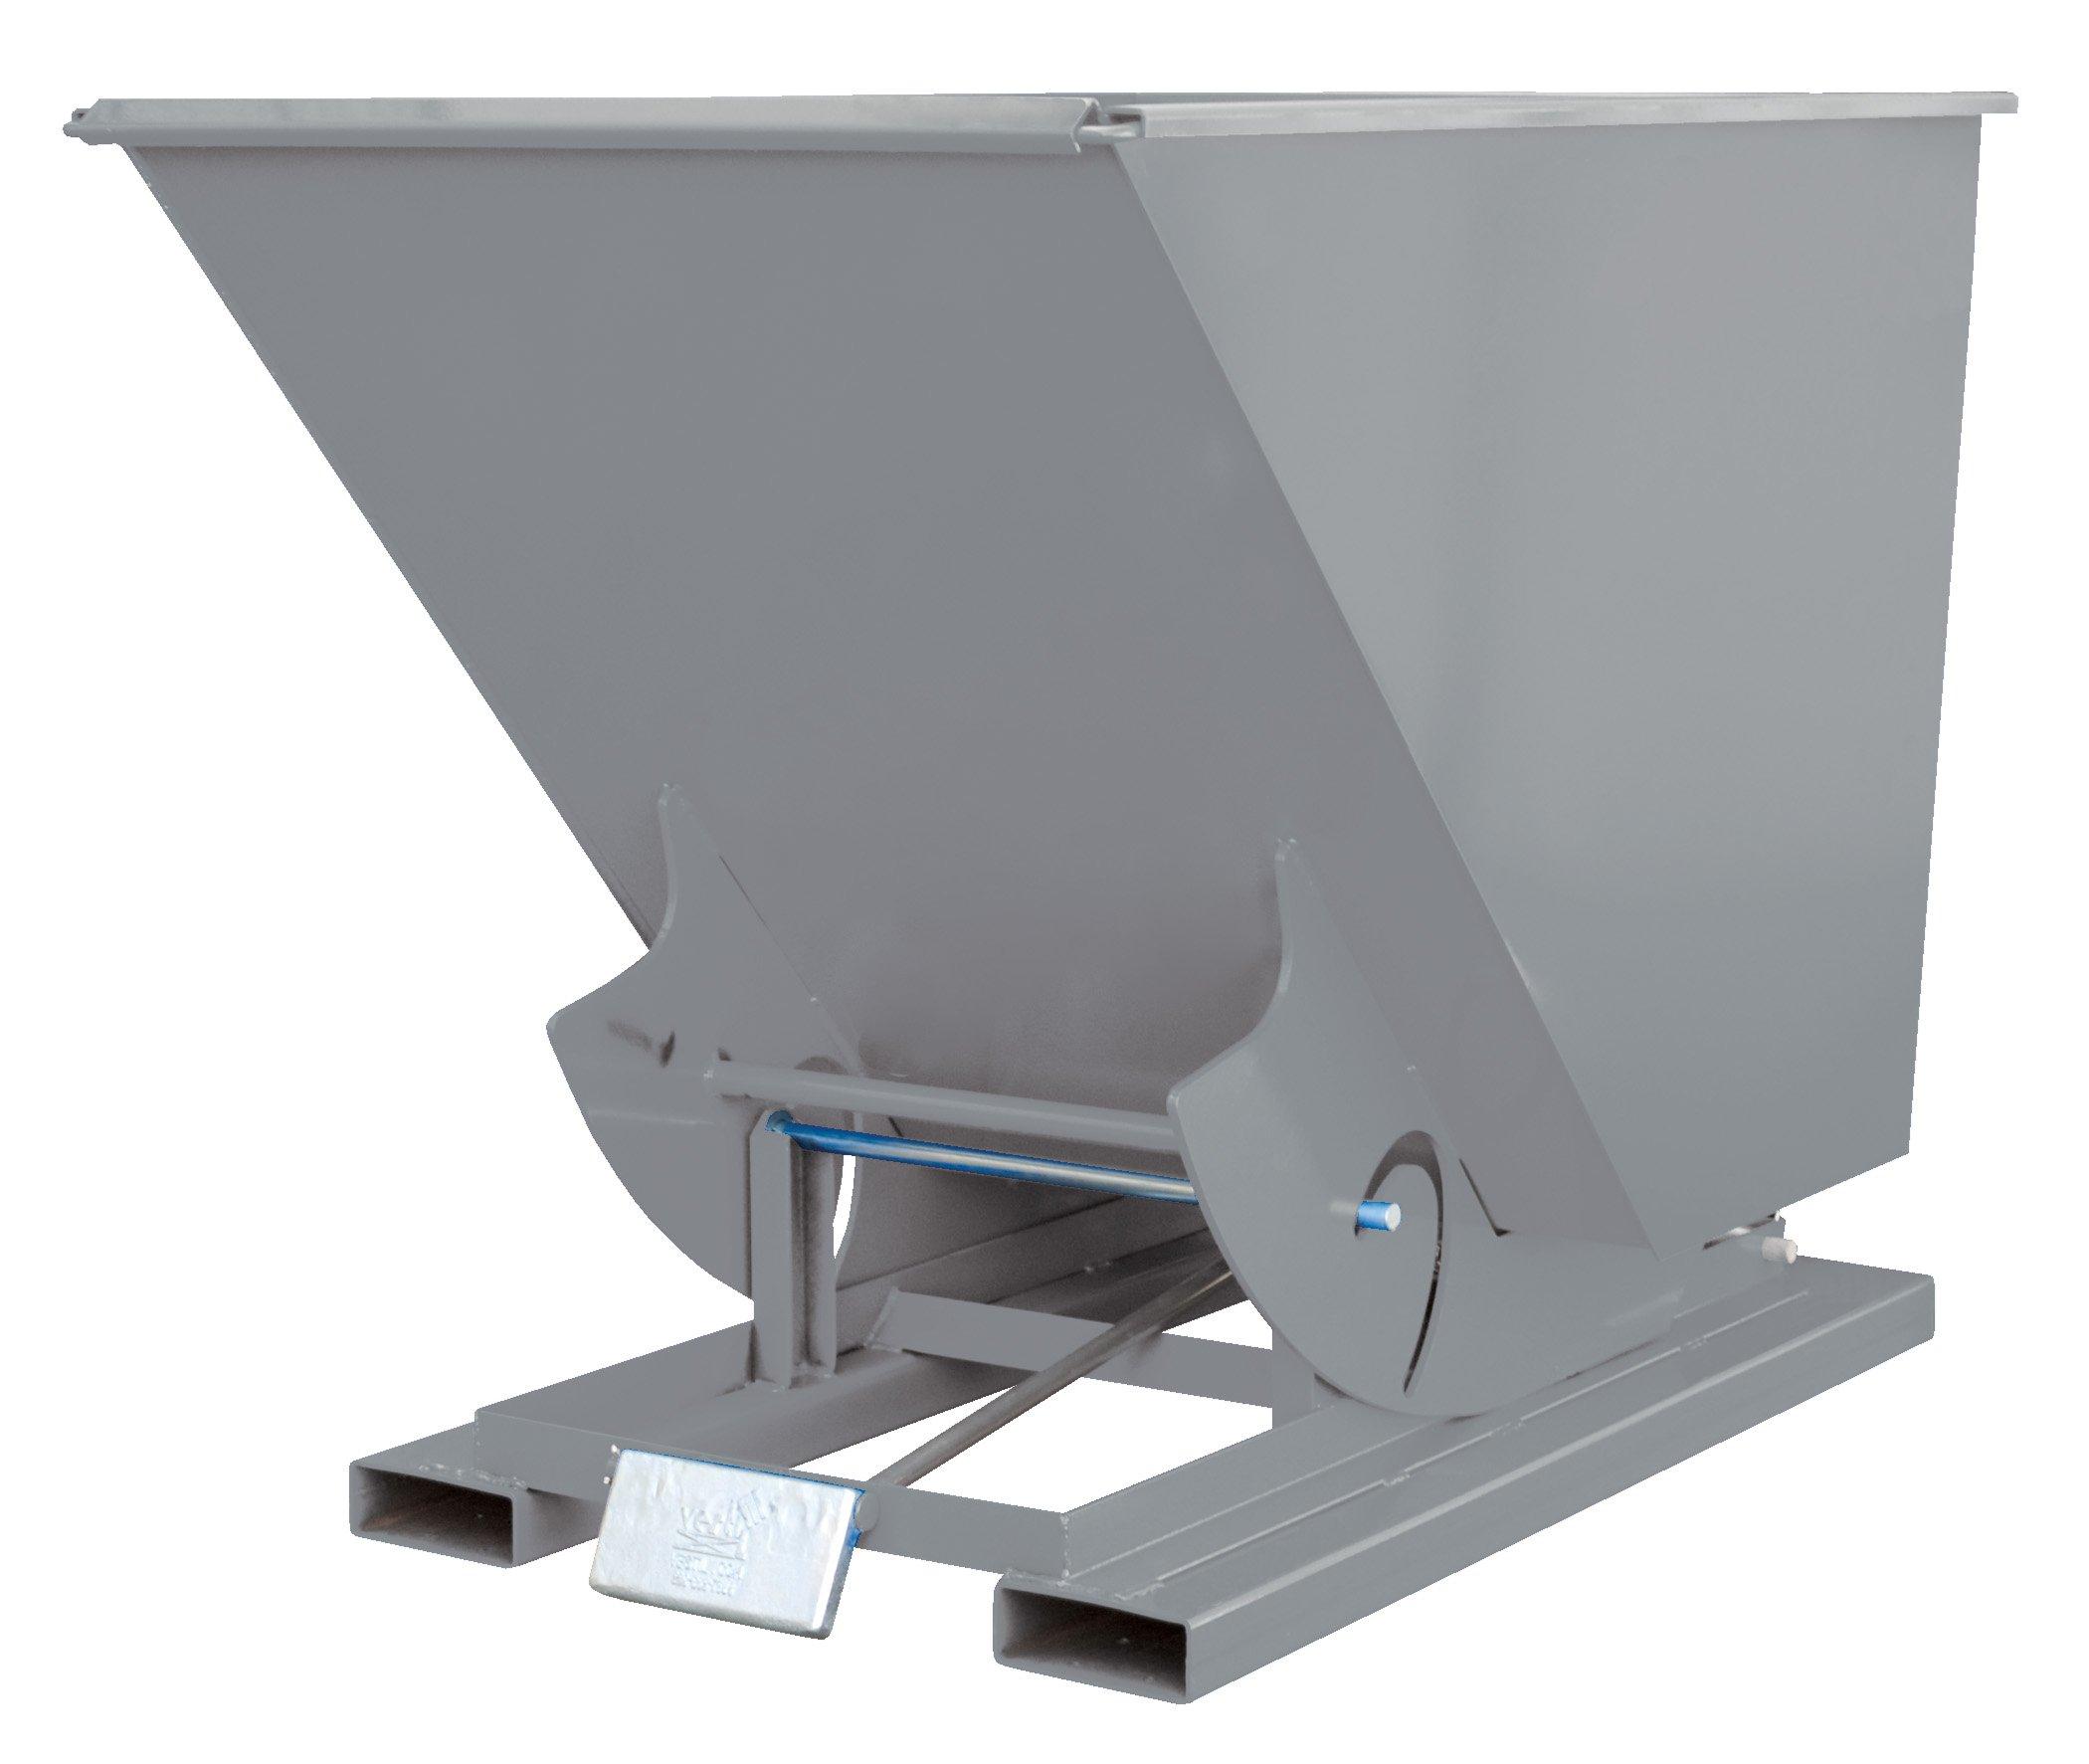 Vestil D-50-HD-GY-SG Self-Dump HD Hopper, 0.5 cu. yd, 6000 lb. Capacity, Overall L x W x H (in.) 51-7/8'' x 33-9/16'' x 38-1/16'', Grey